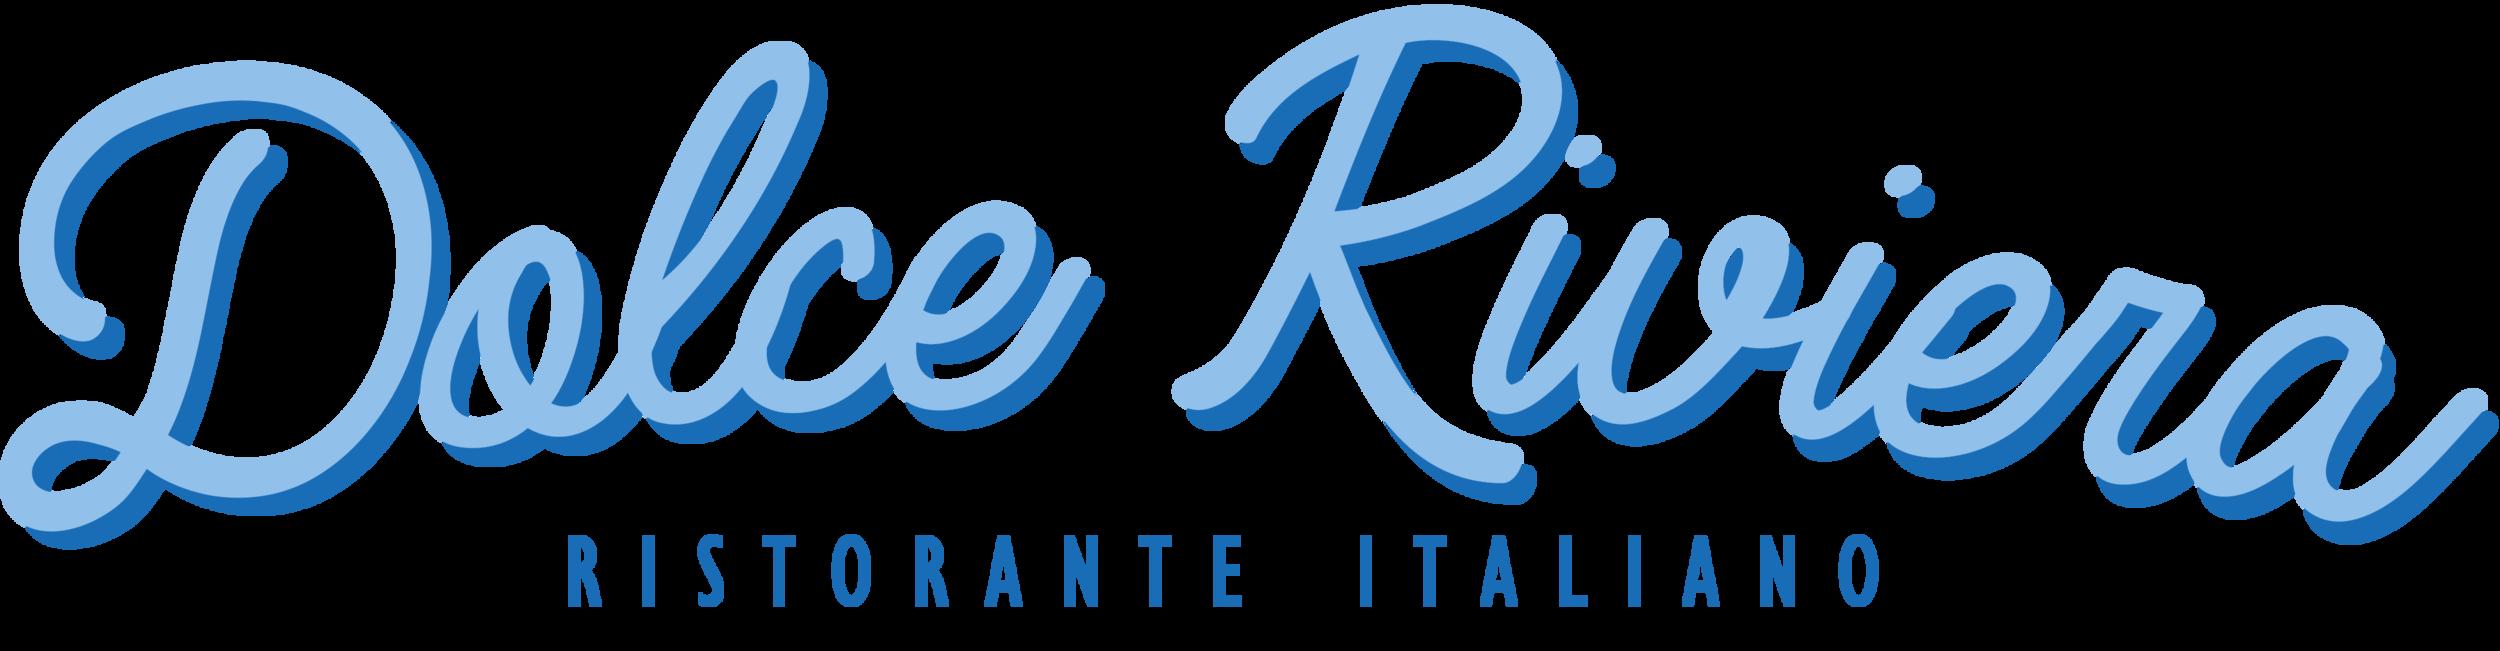 Dolce Riviera Logo - Copy.png